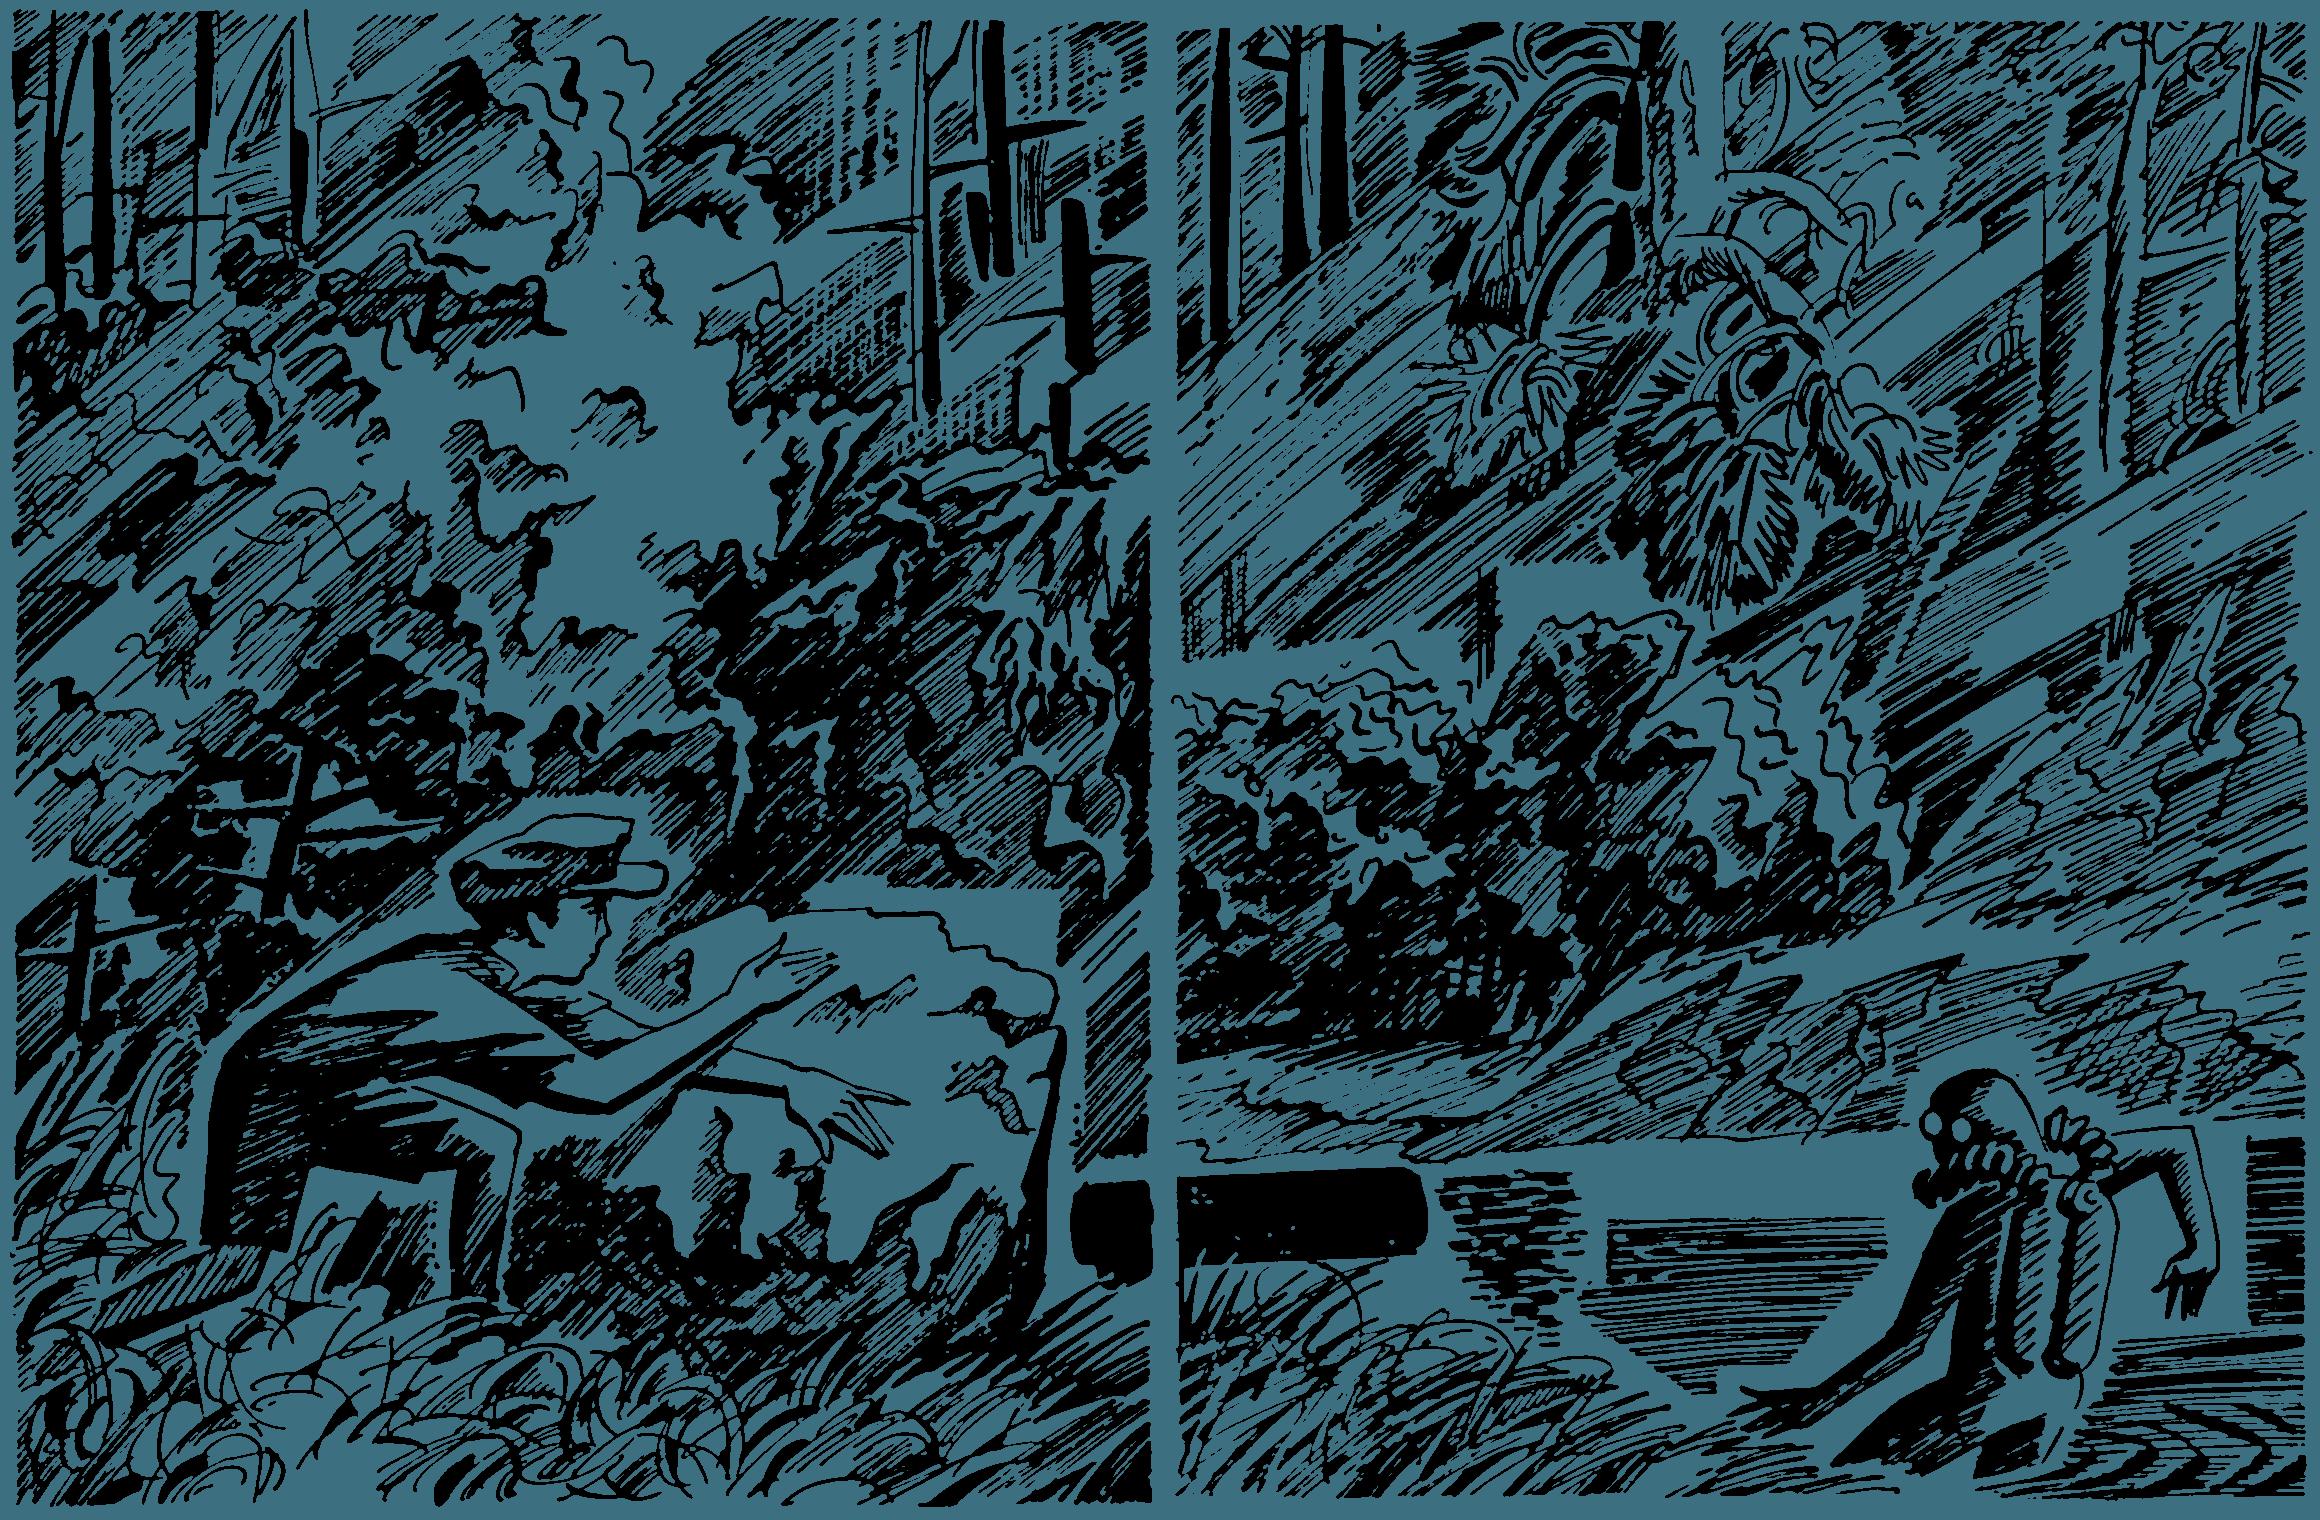 Пятёрка отважных. Лань — река лесная